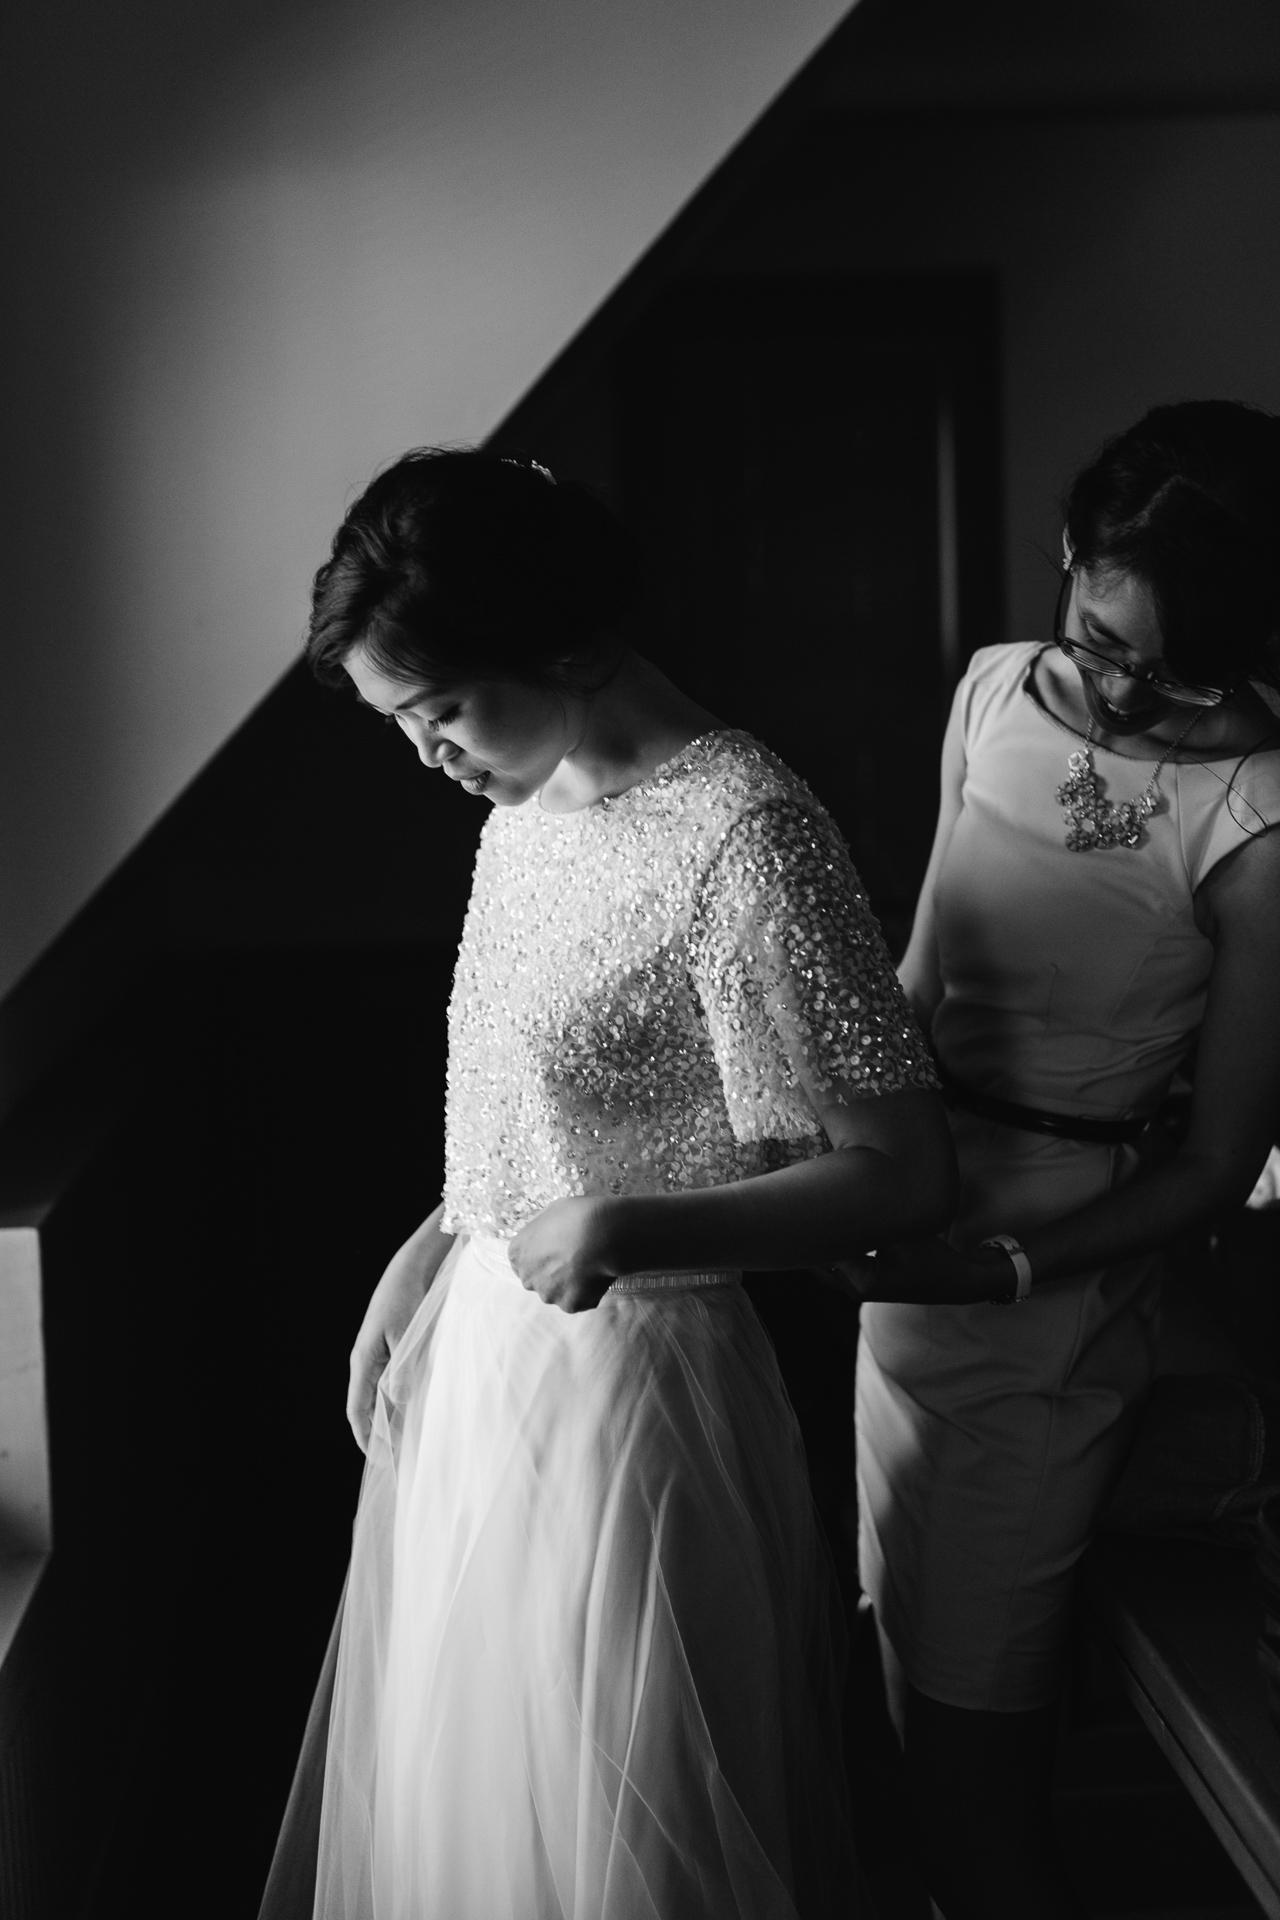 jess-hunter-seattle-artistic-wedding-photographer-3882.jpg